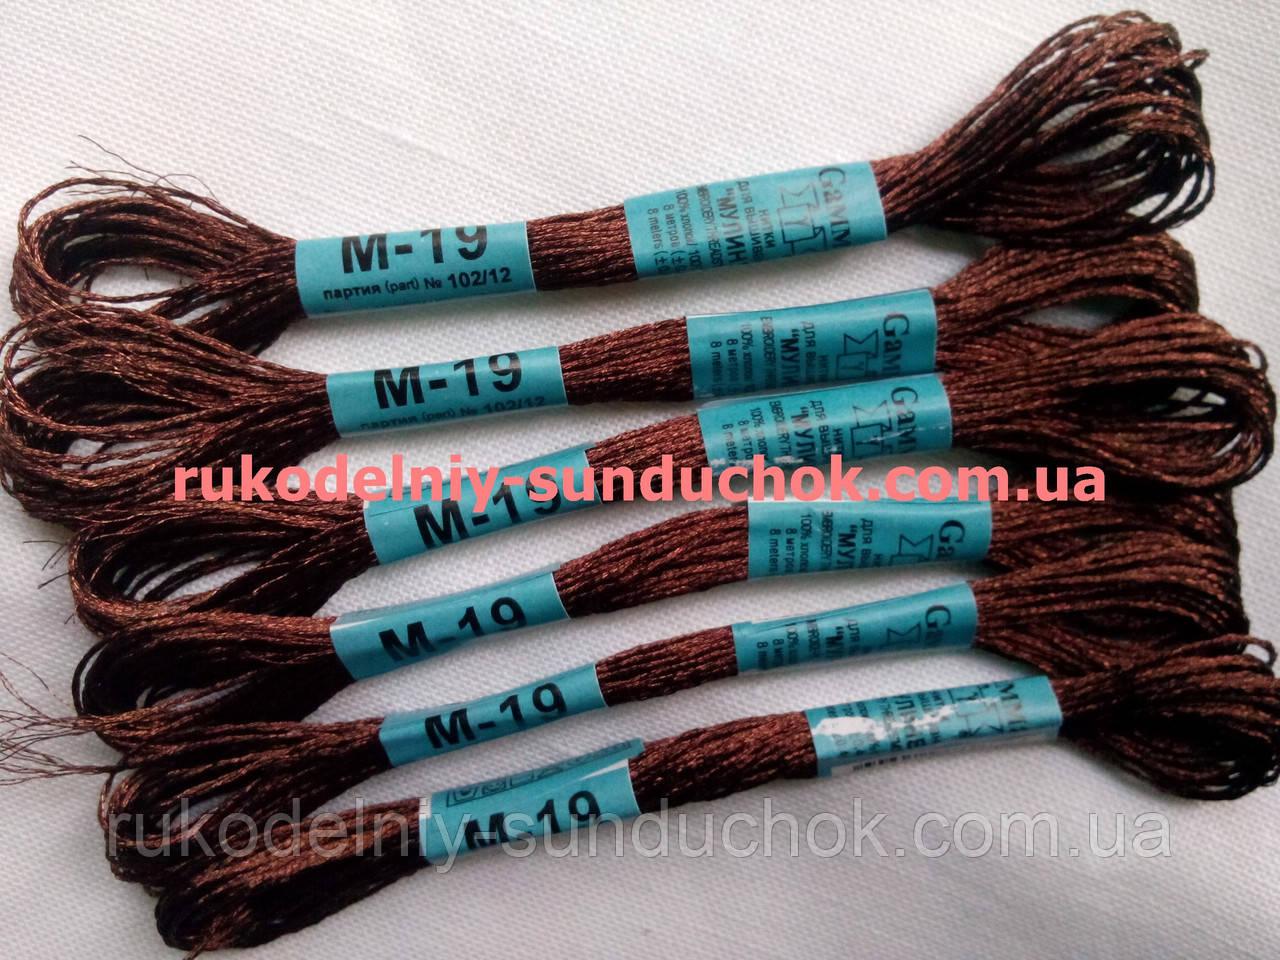 Мулине гамма металлик (Gamma) М-19